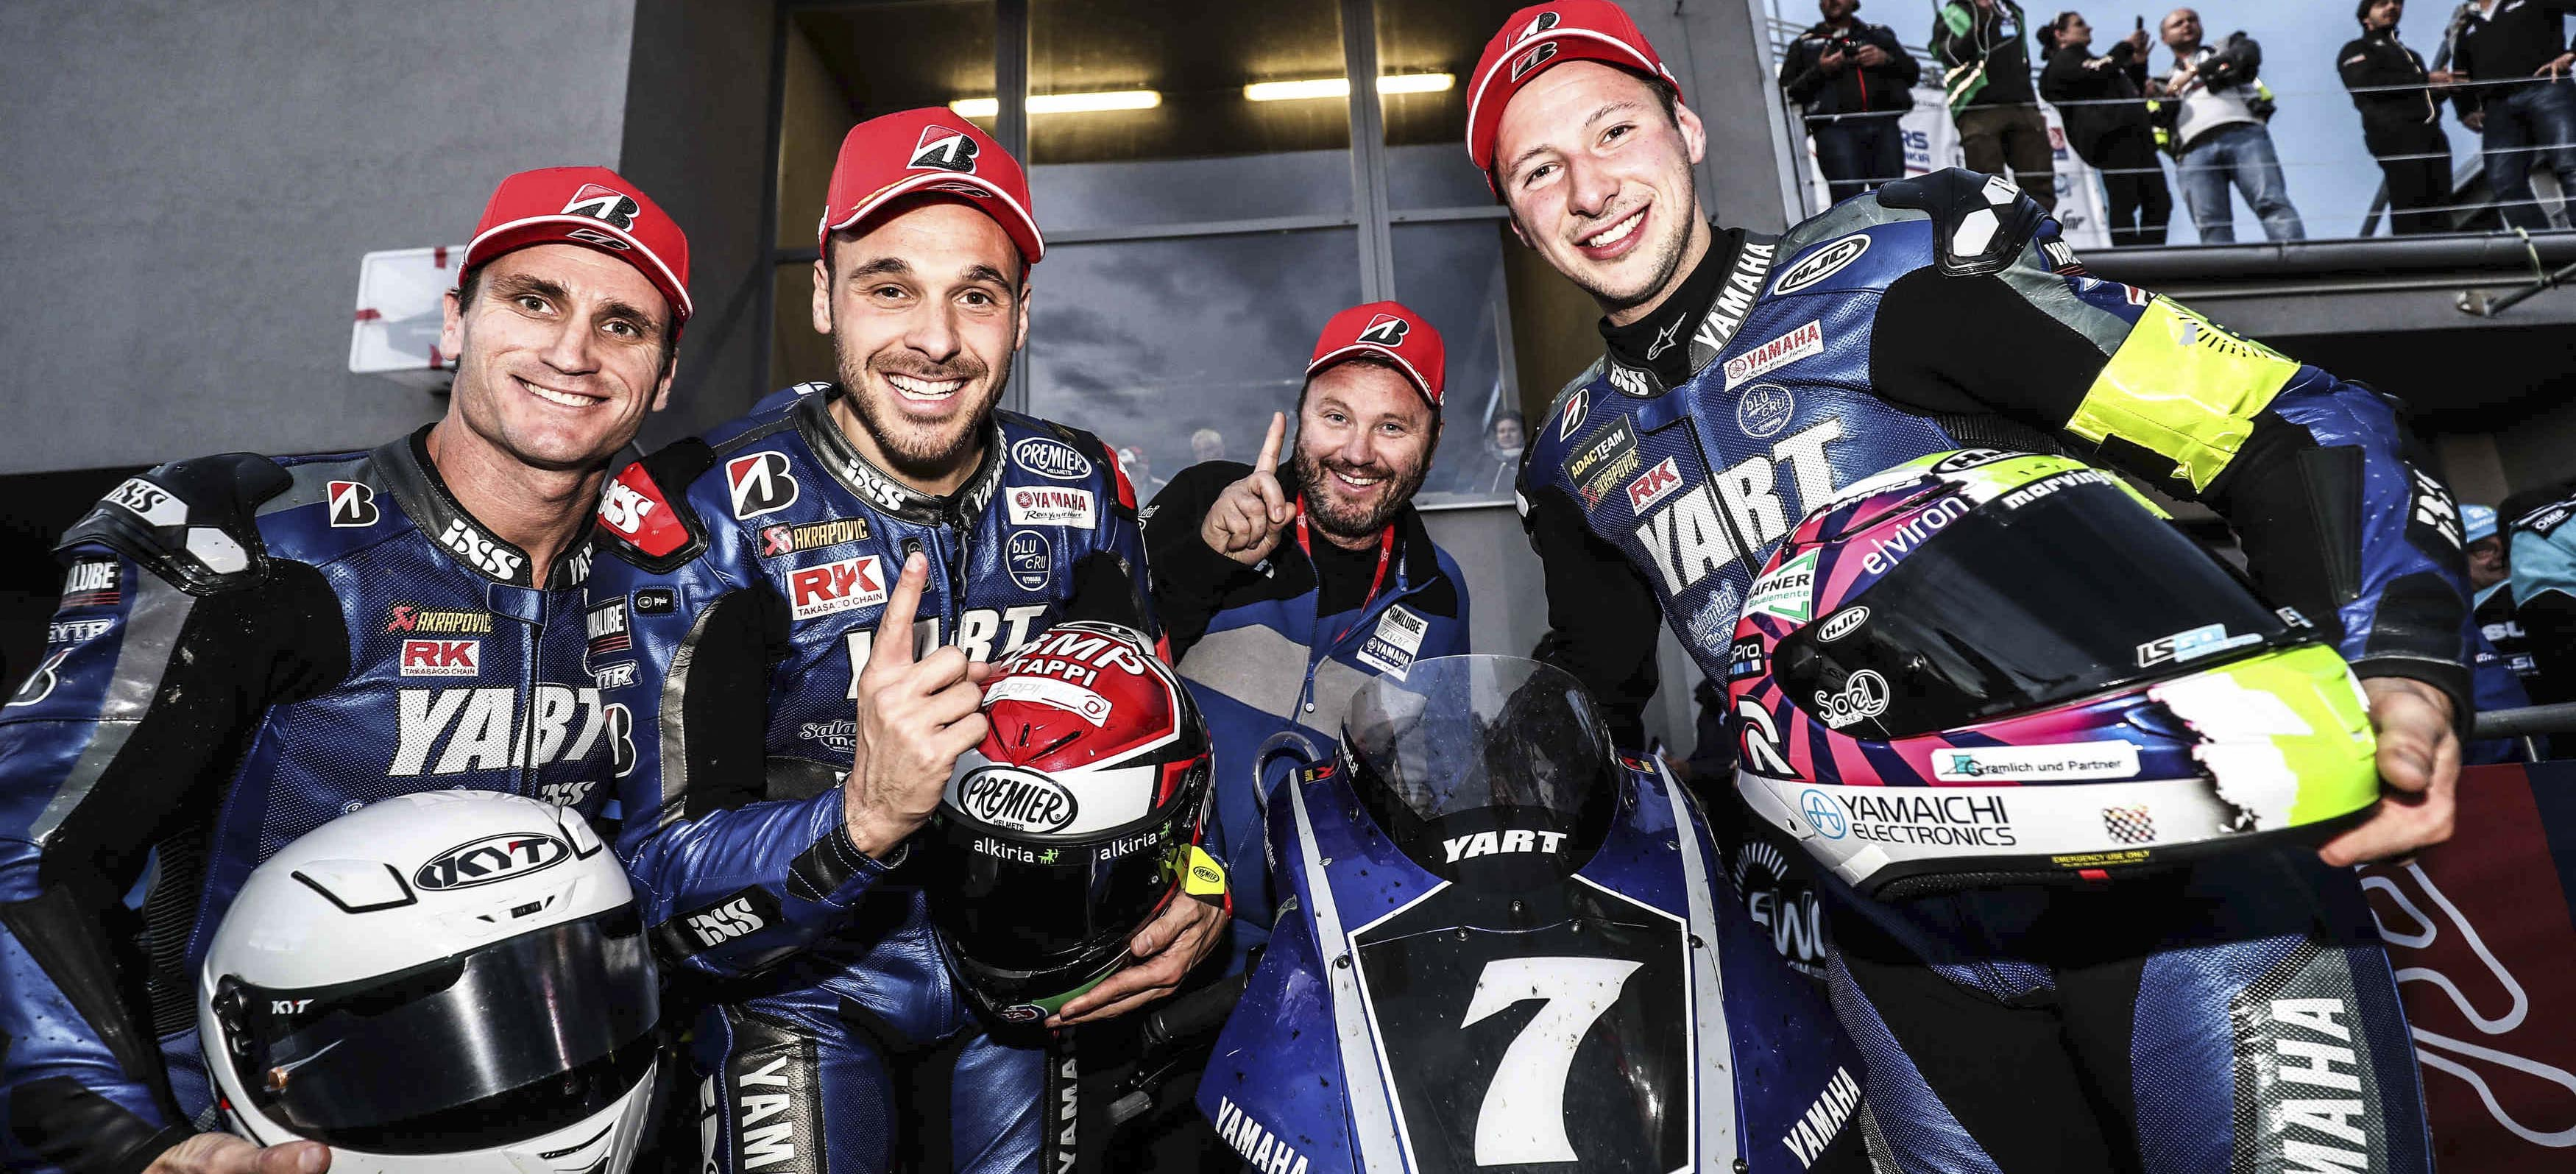 YART win Slovakia race